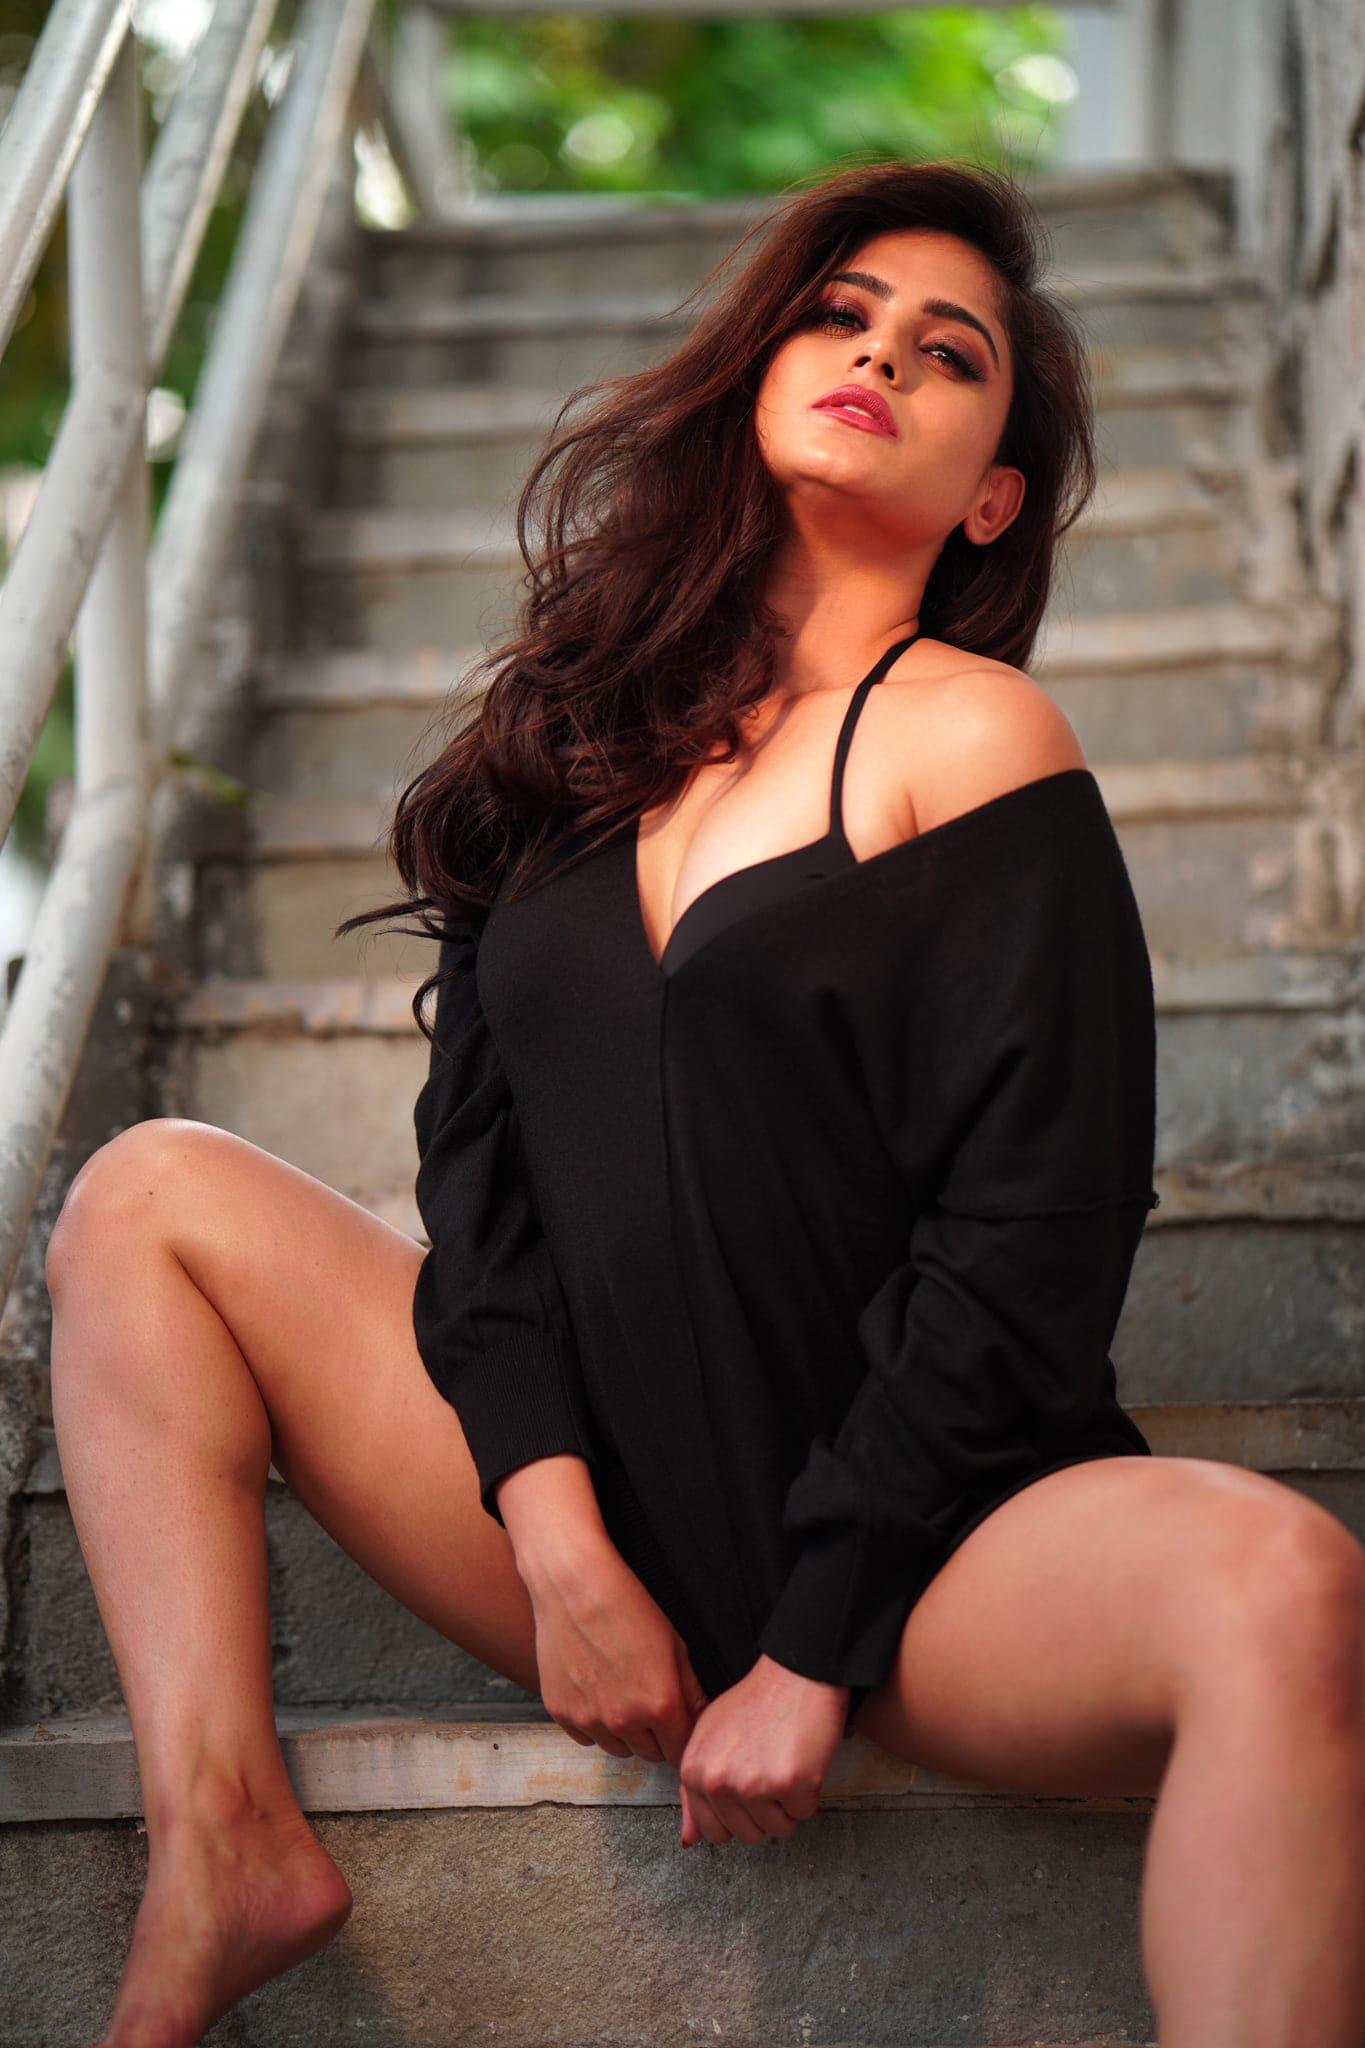 Naina Ganguly : నైనా గంగూలీ హాట్ పిక్స్ Photo : Facebook